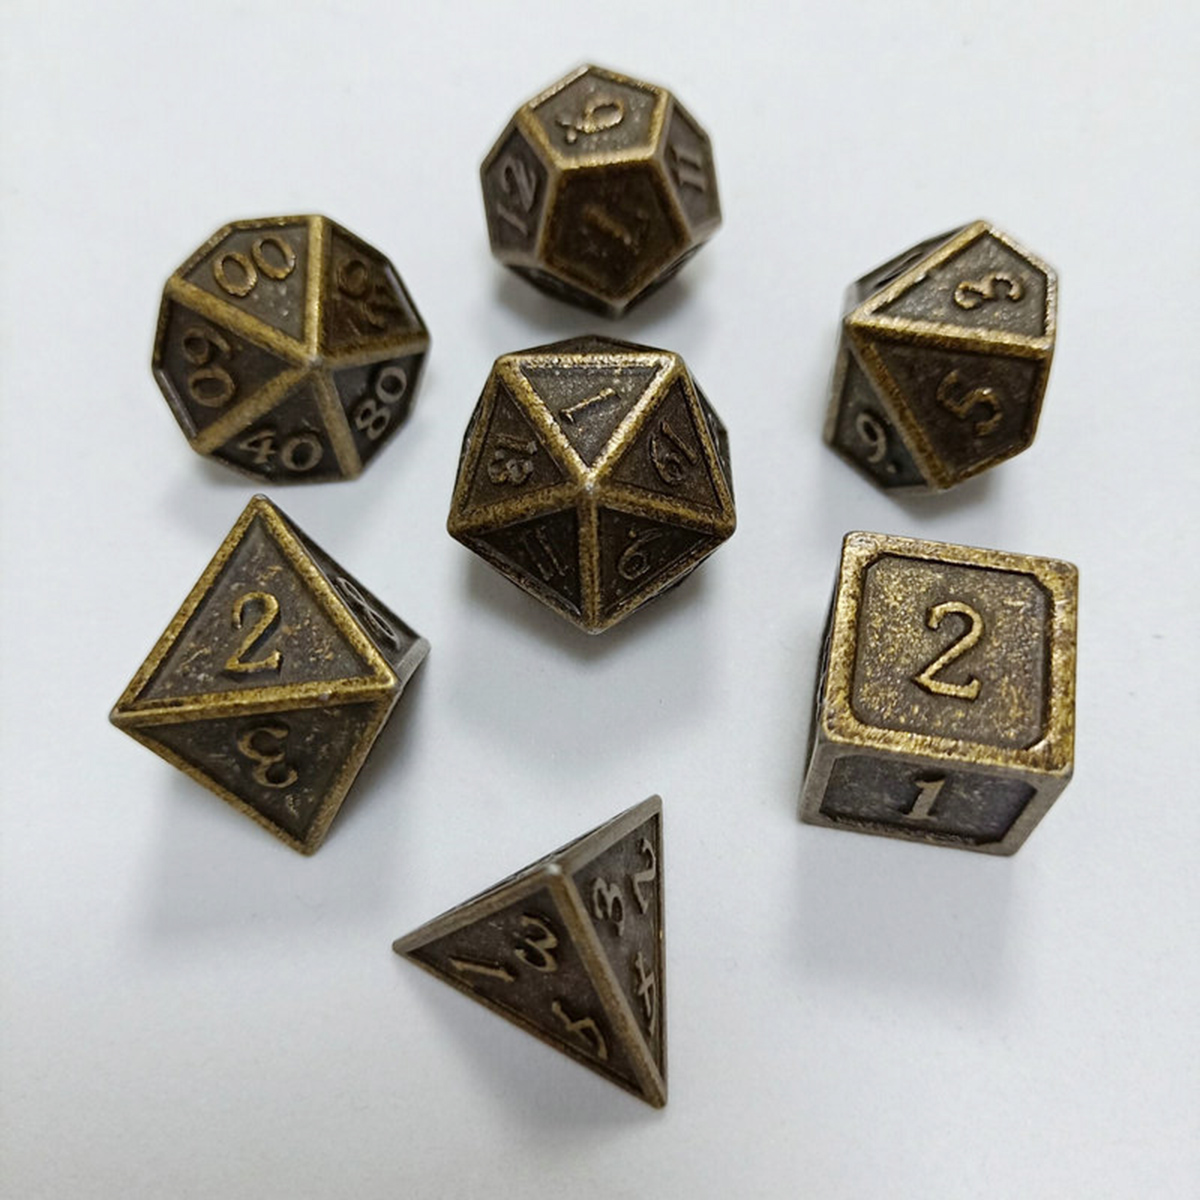 7Pcs Metal Polyhedral Dice DnD RPG TRPG Games Dices SET With Storage Bag